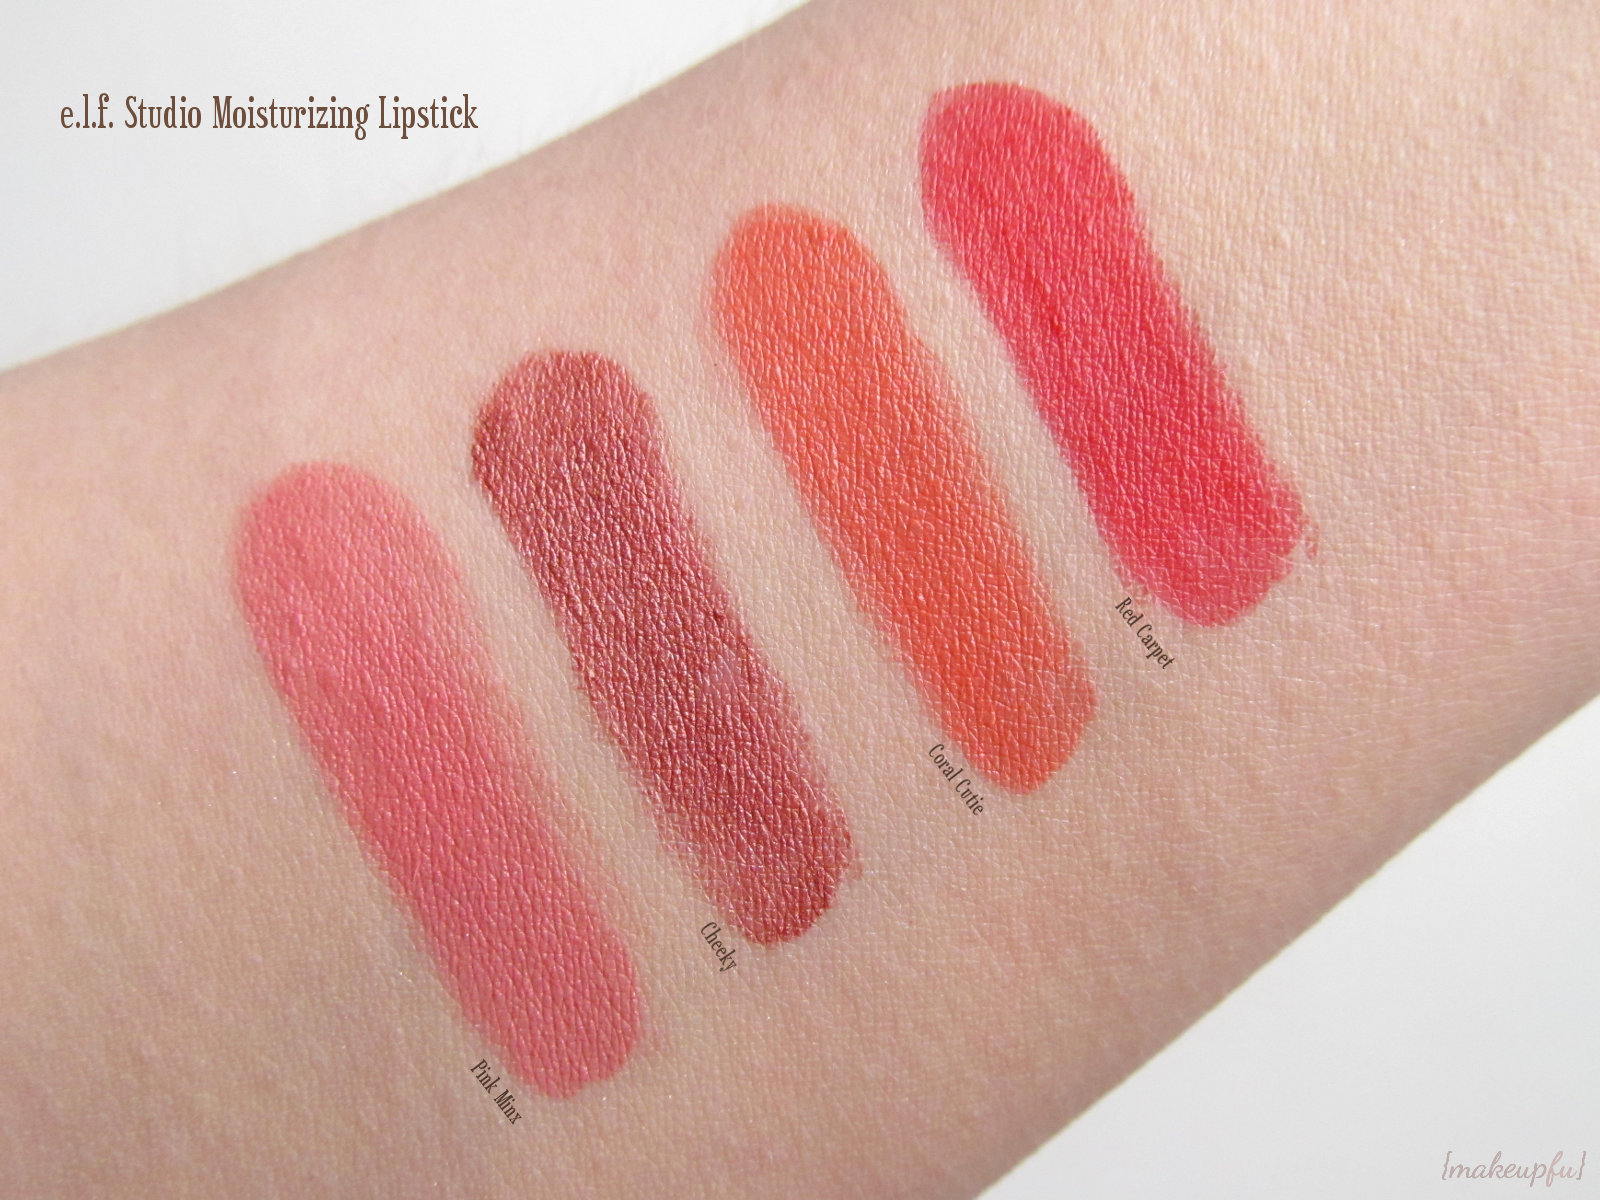 e.l.f. Studio Moisturizing Lipsticks |